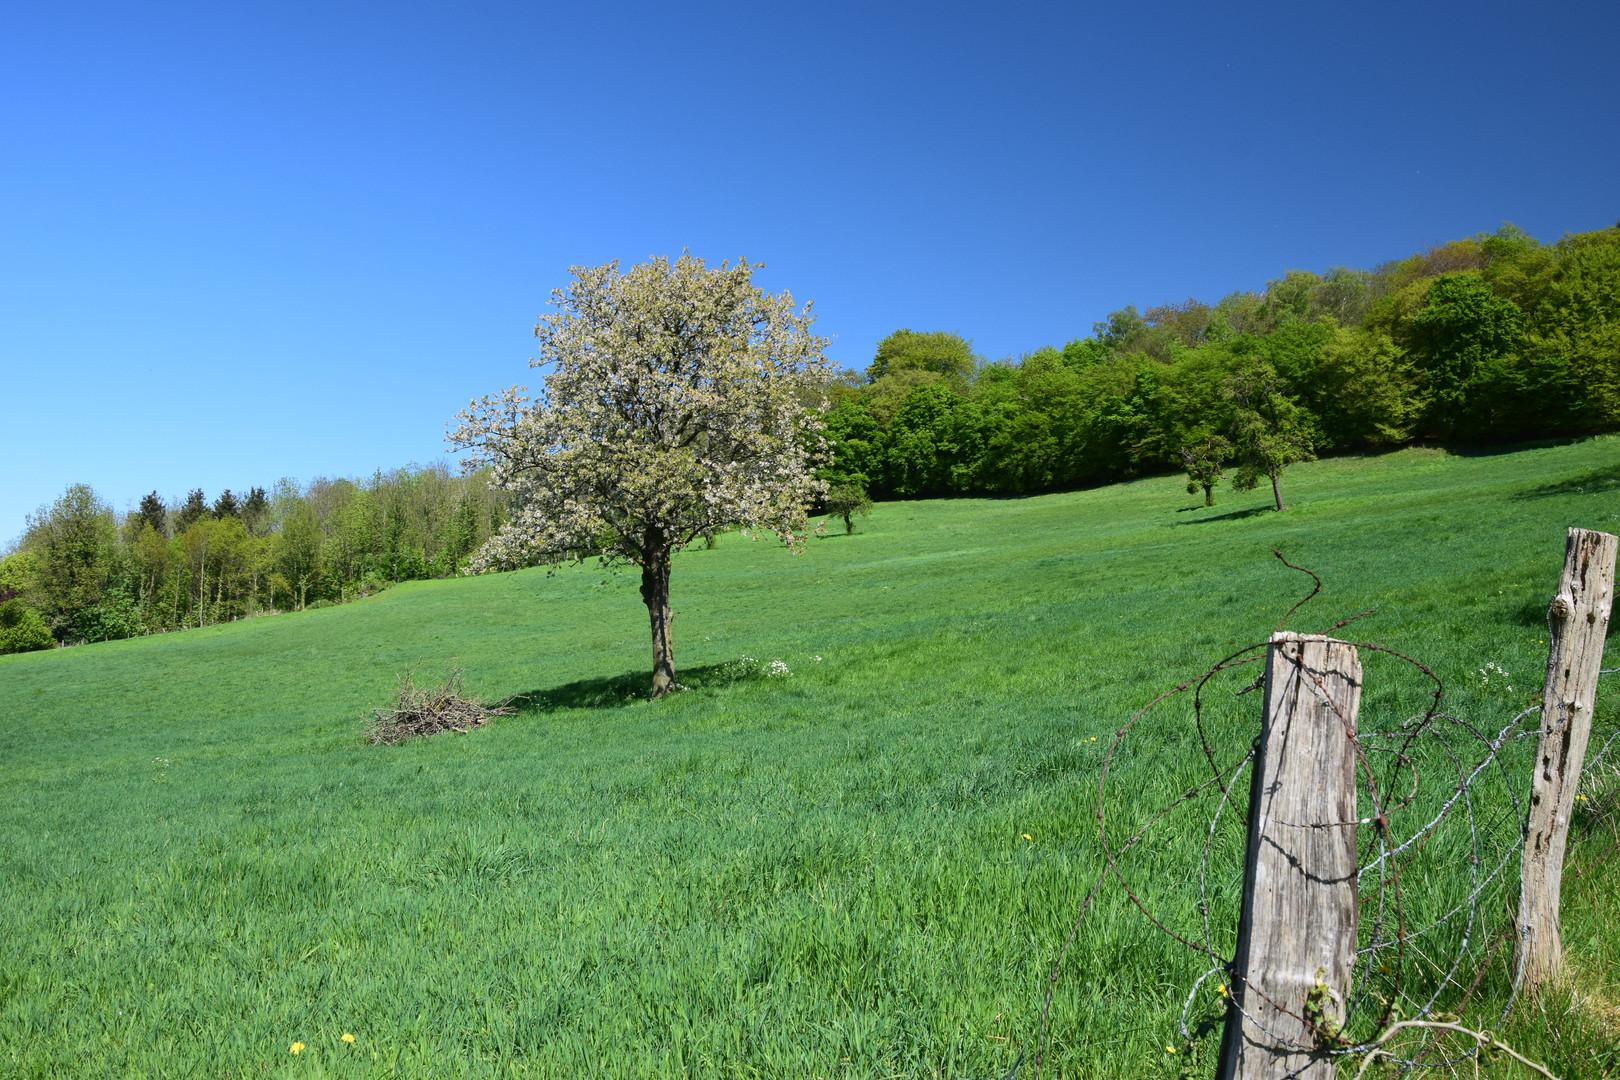 Mille Fleurs - Surrounding area